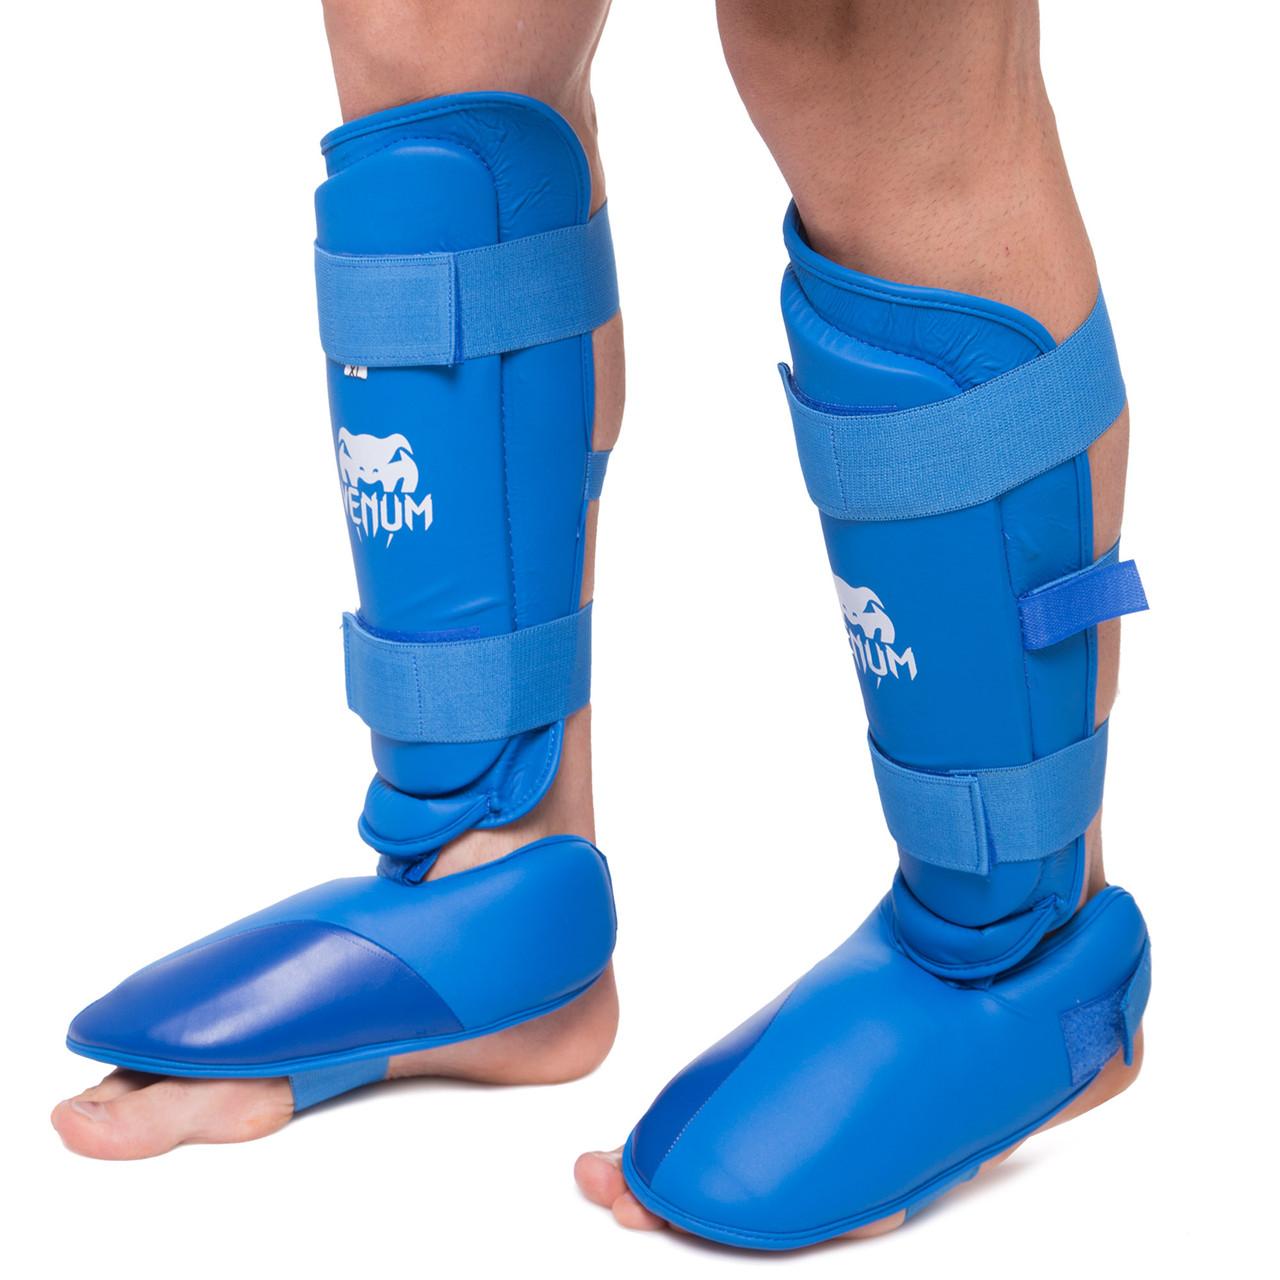 Защита голени с футами для единоборств PU VNM (р-р S-XL, цвета в ассортименте)